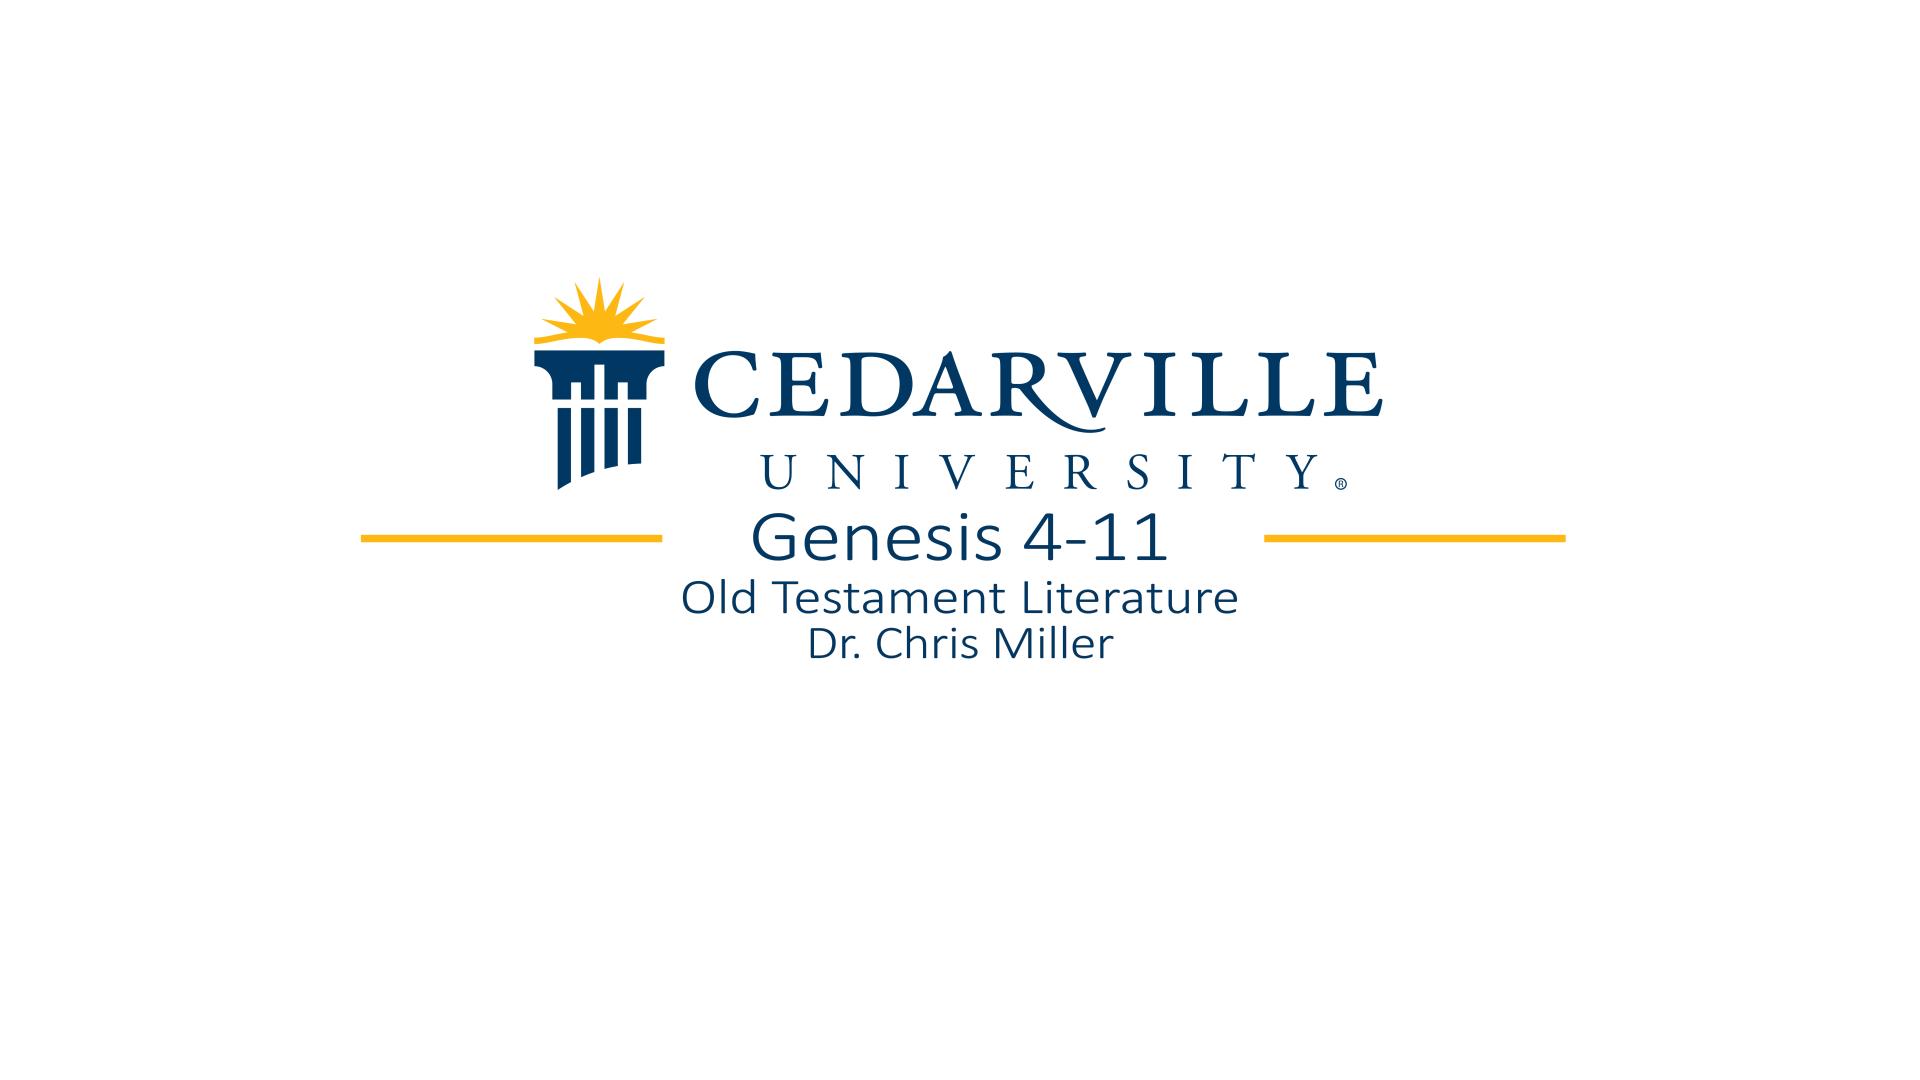 View thumbnail for Genesis 4-11